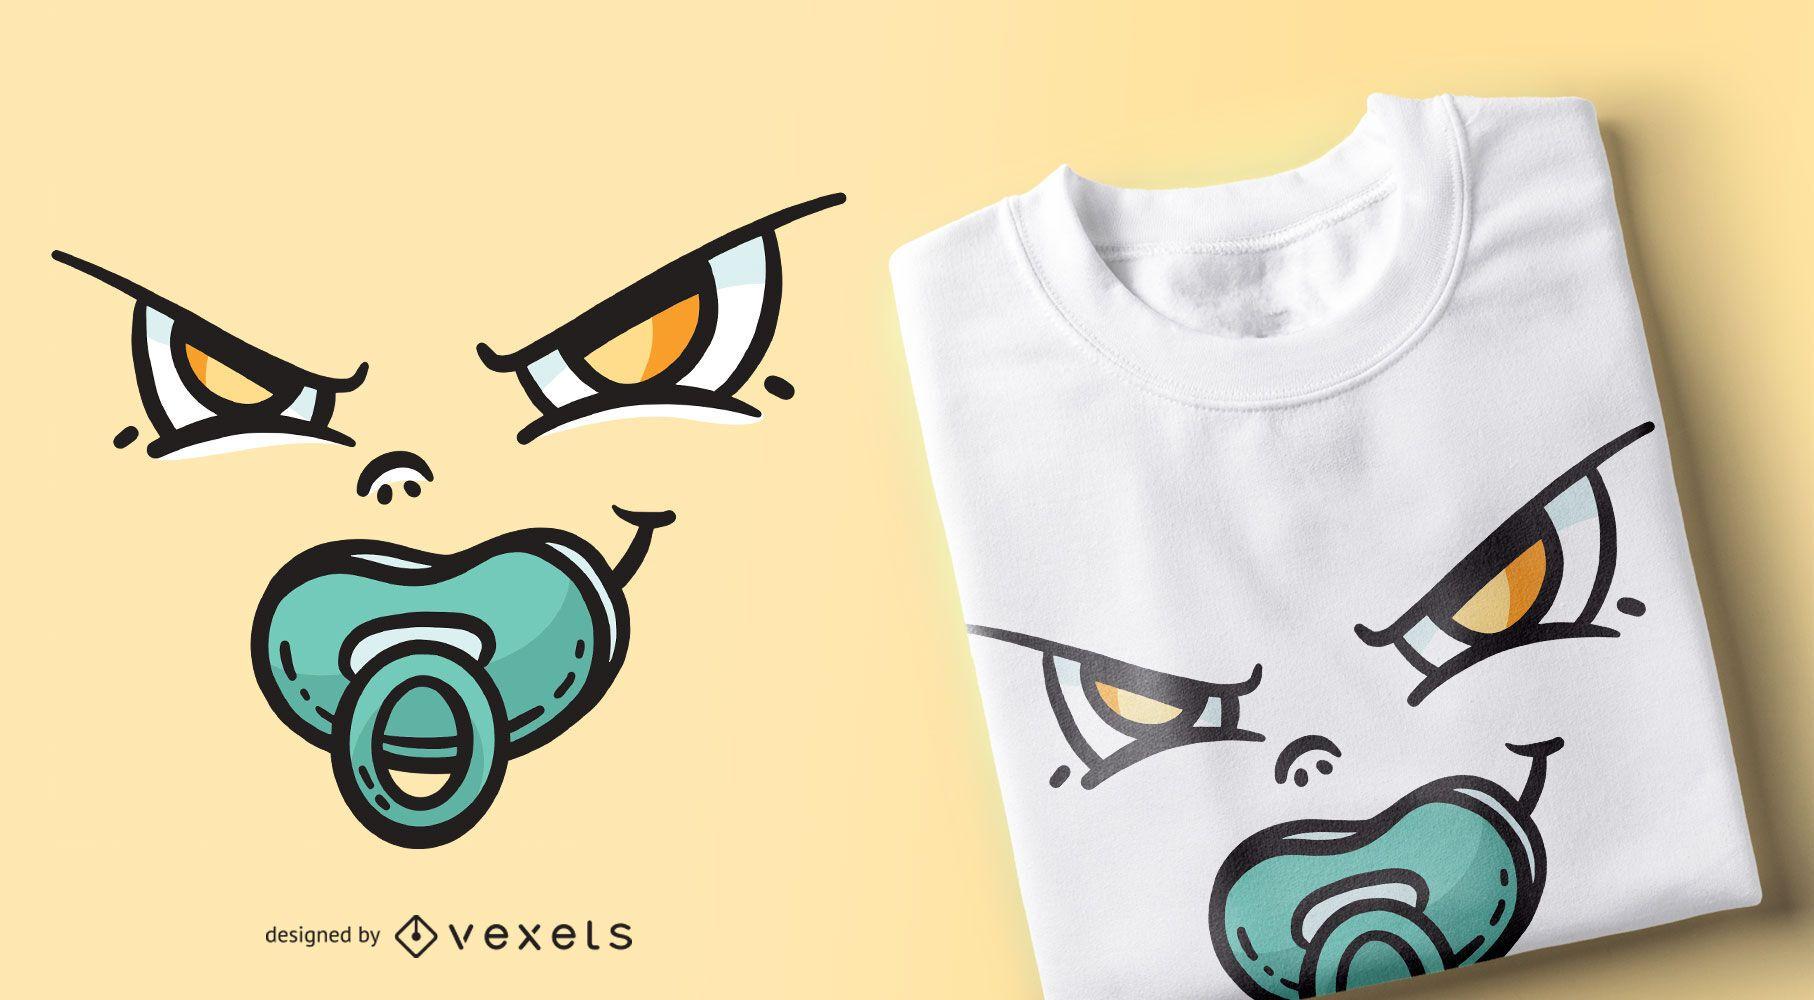 Baby face t-shirt design